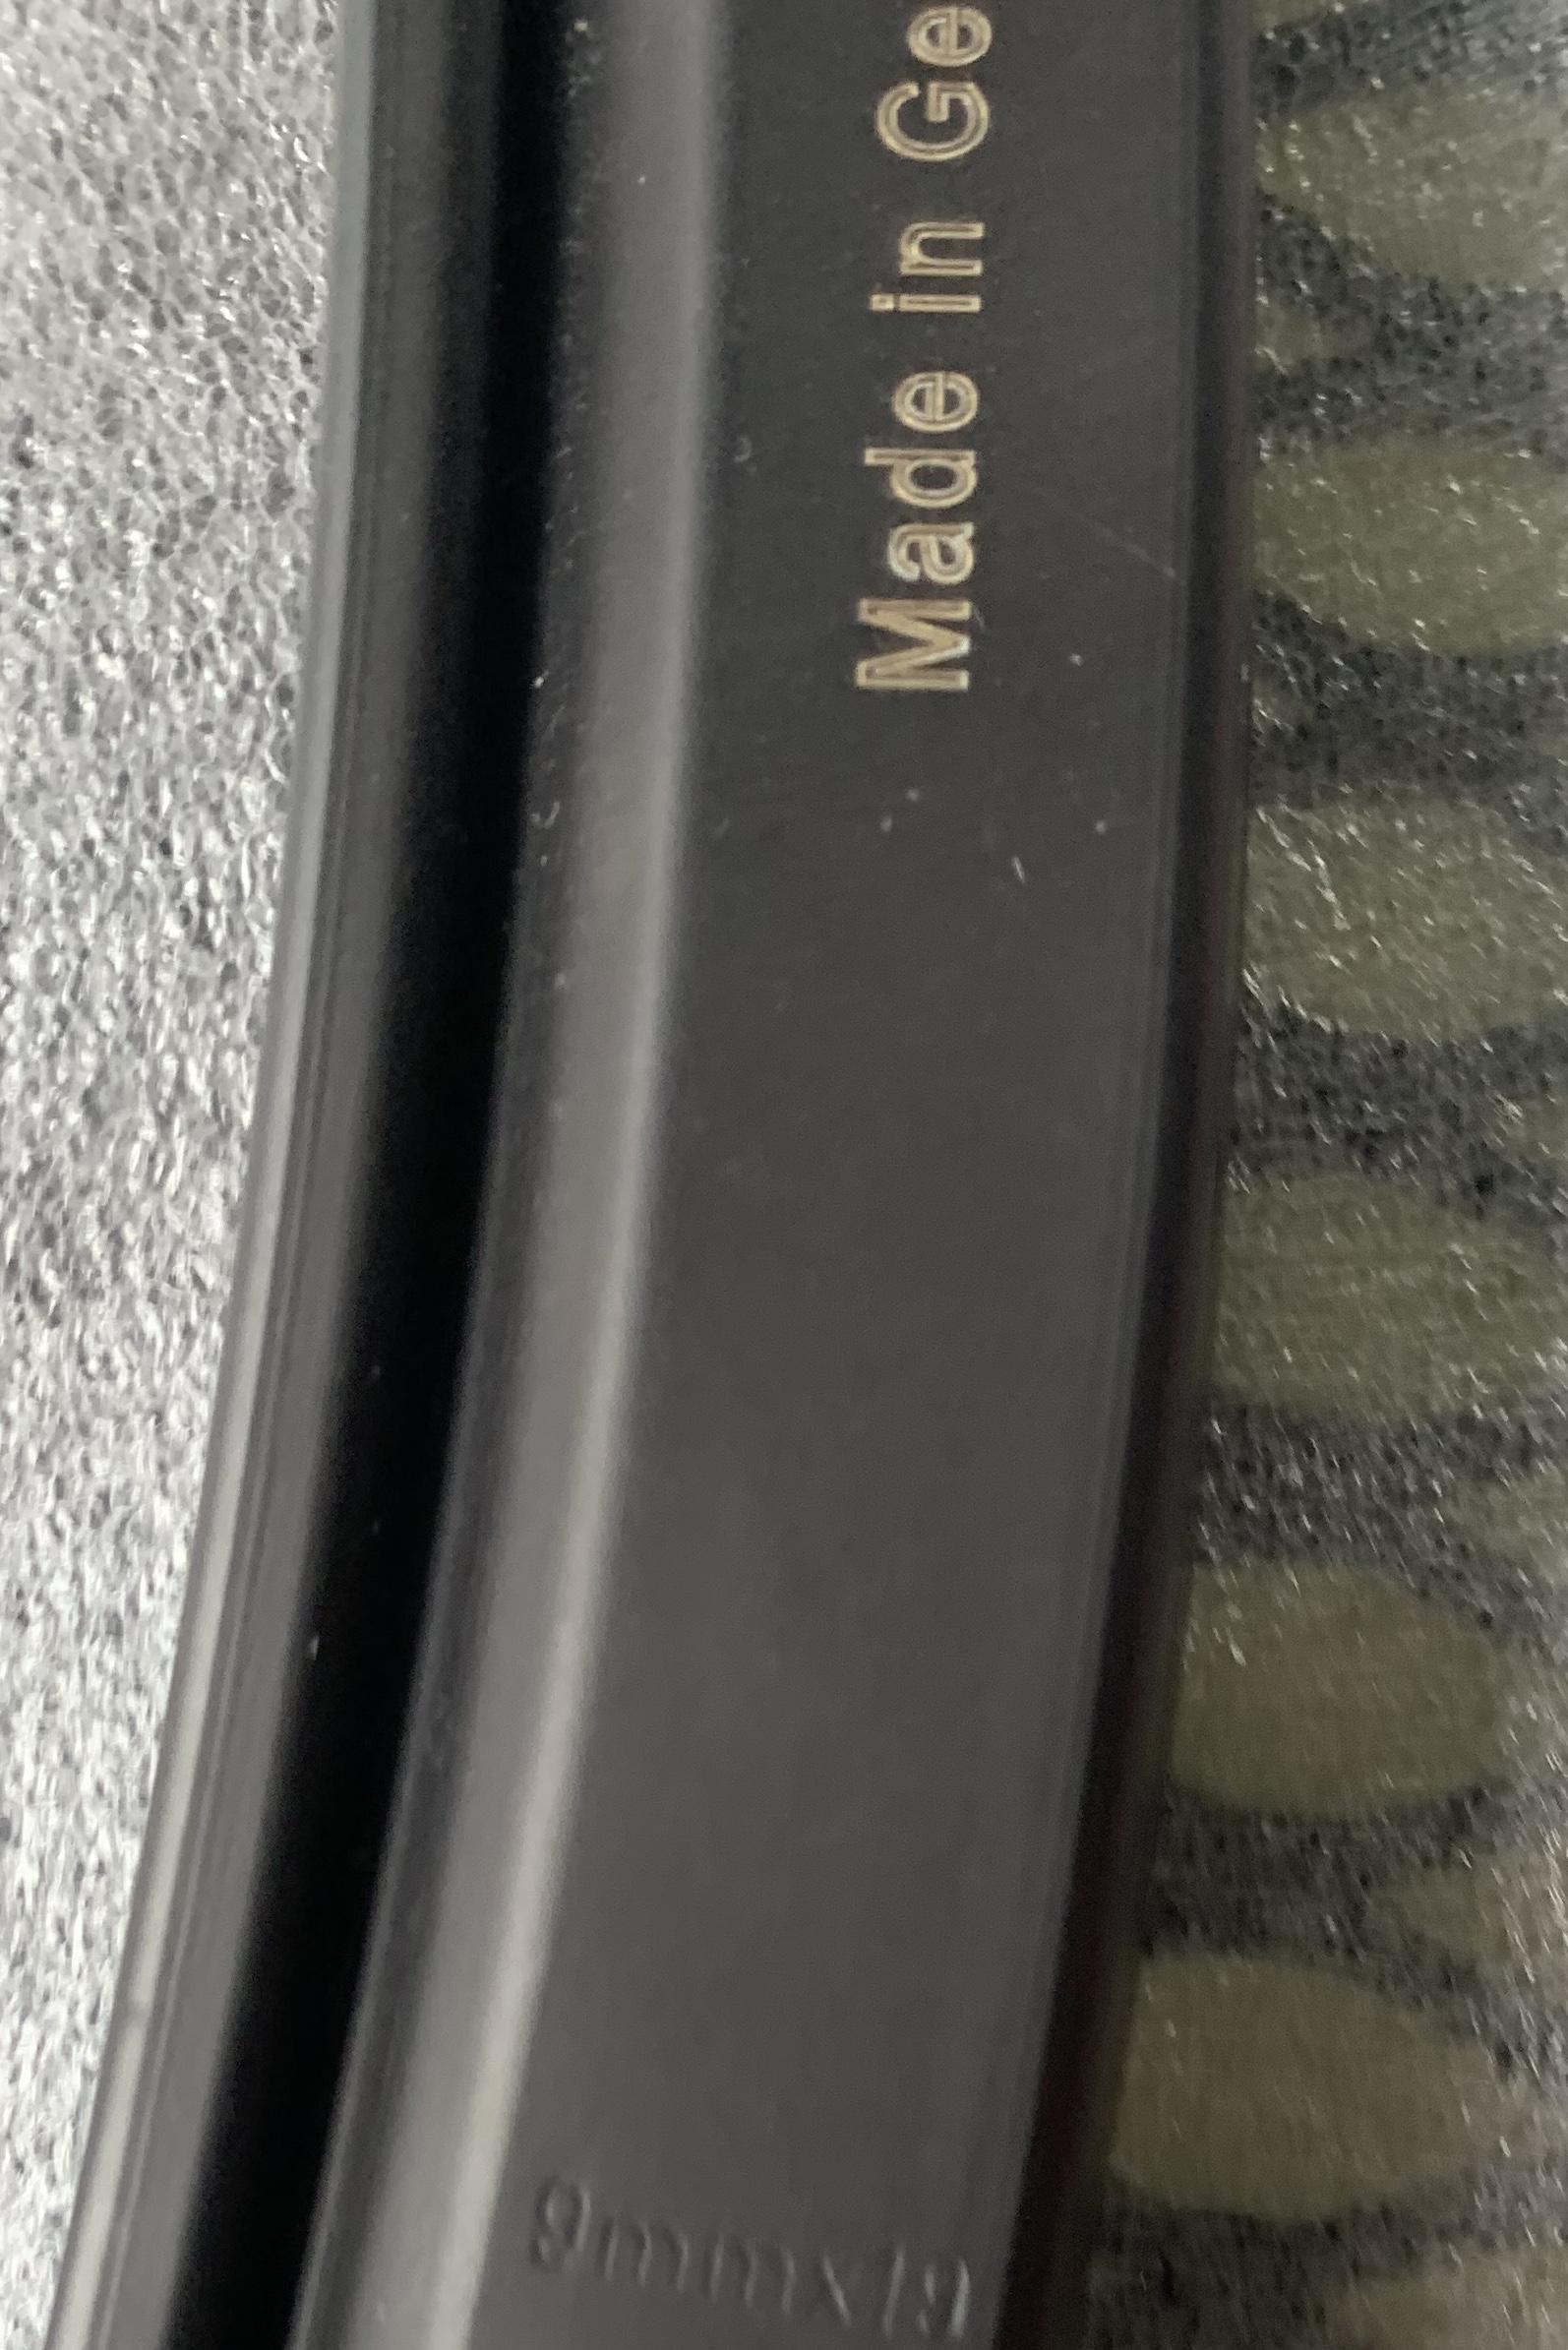 Genuine HK MP5 Magazine ?-image2.jpeg